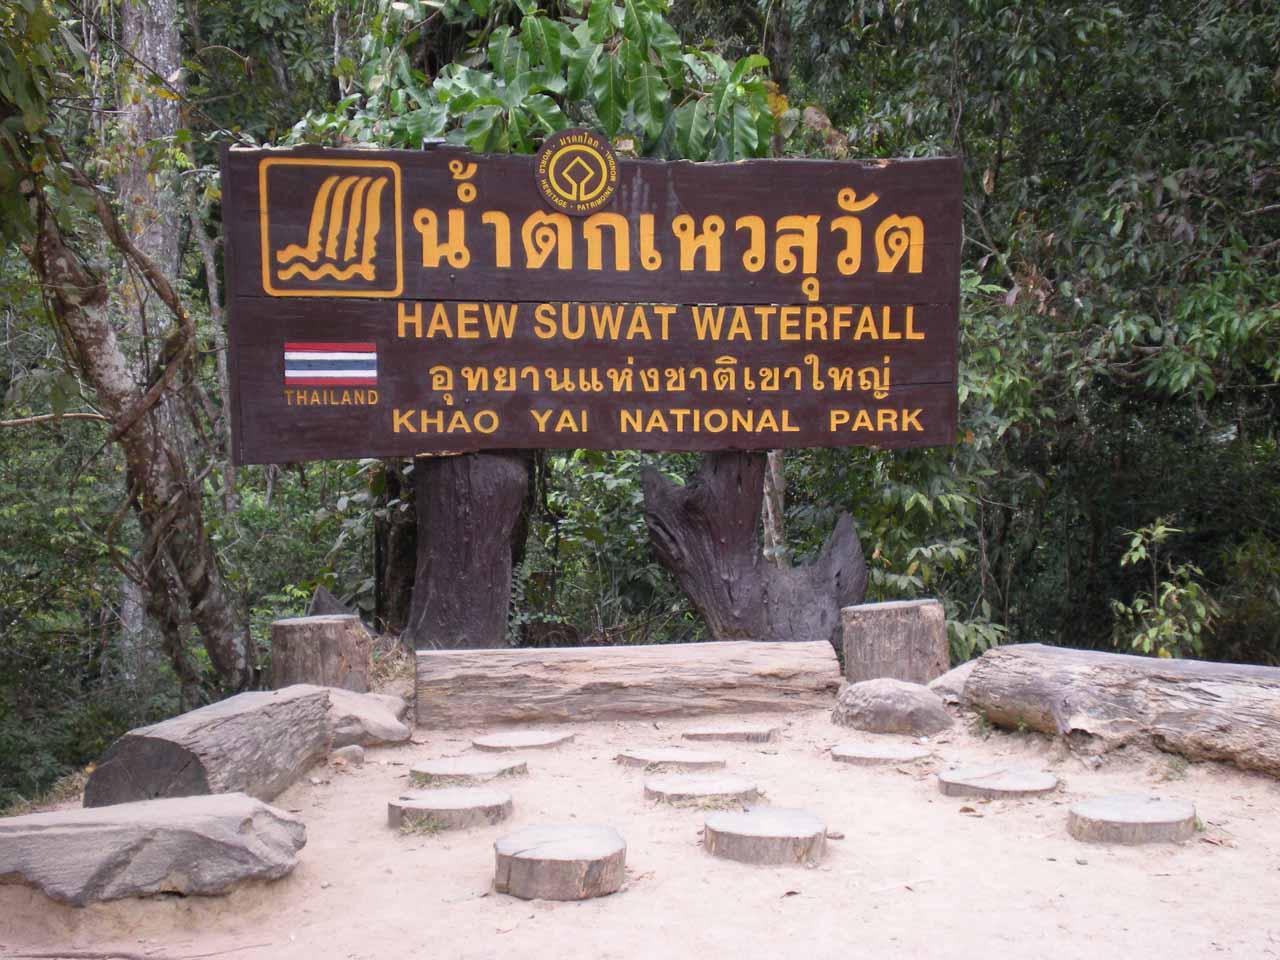 At the Haew Suwat Waterfall car park